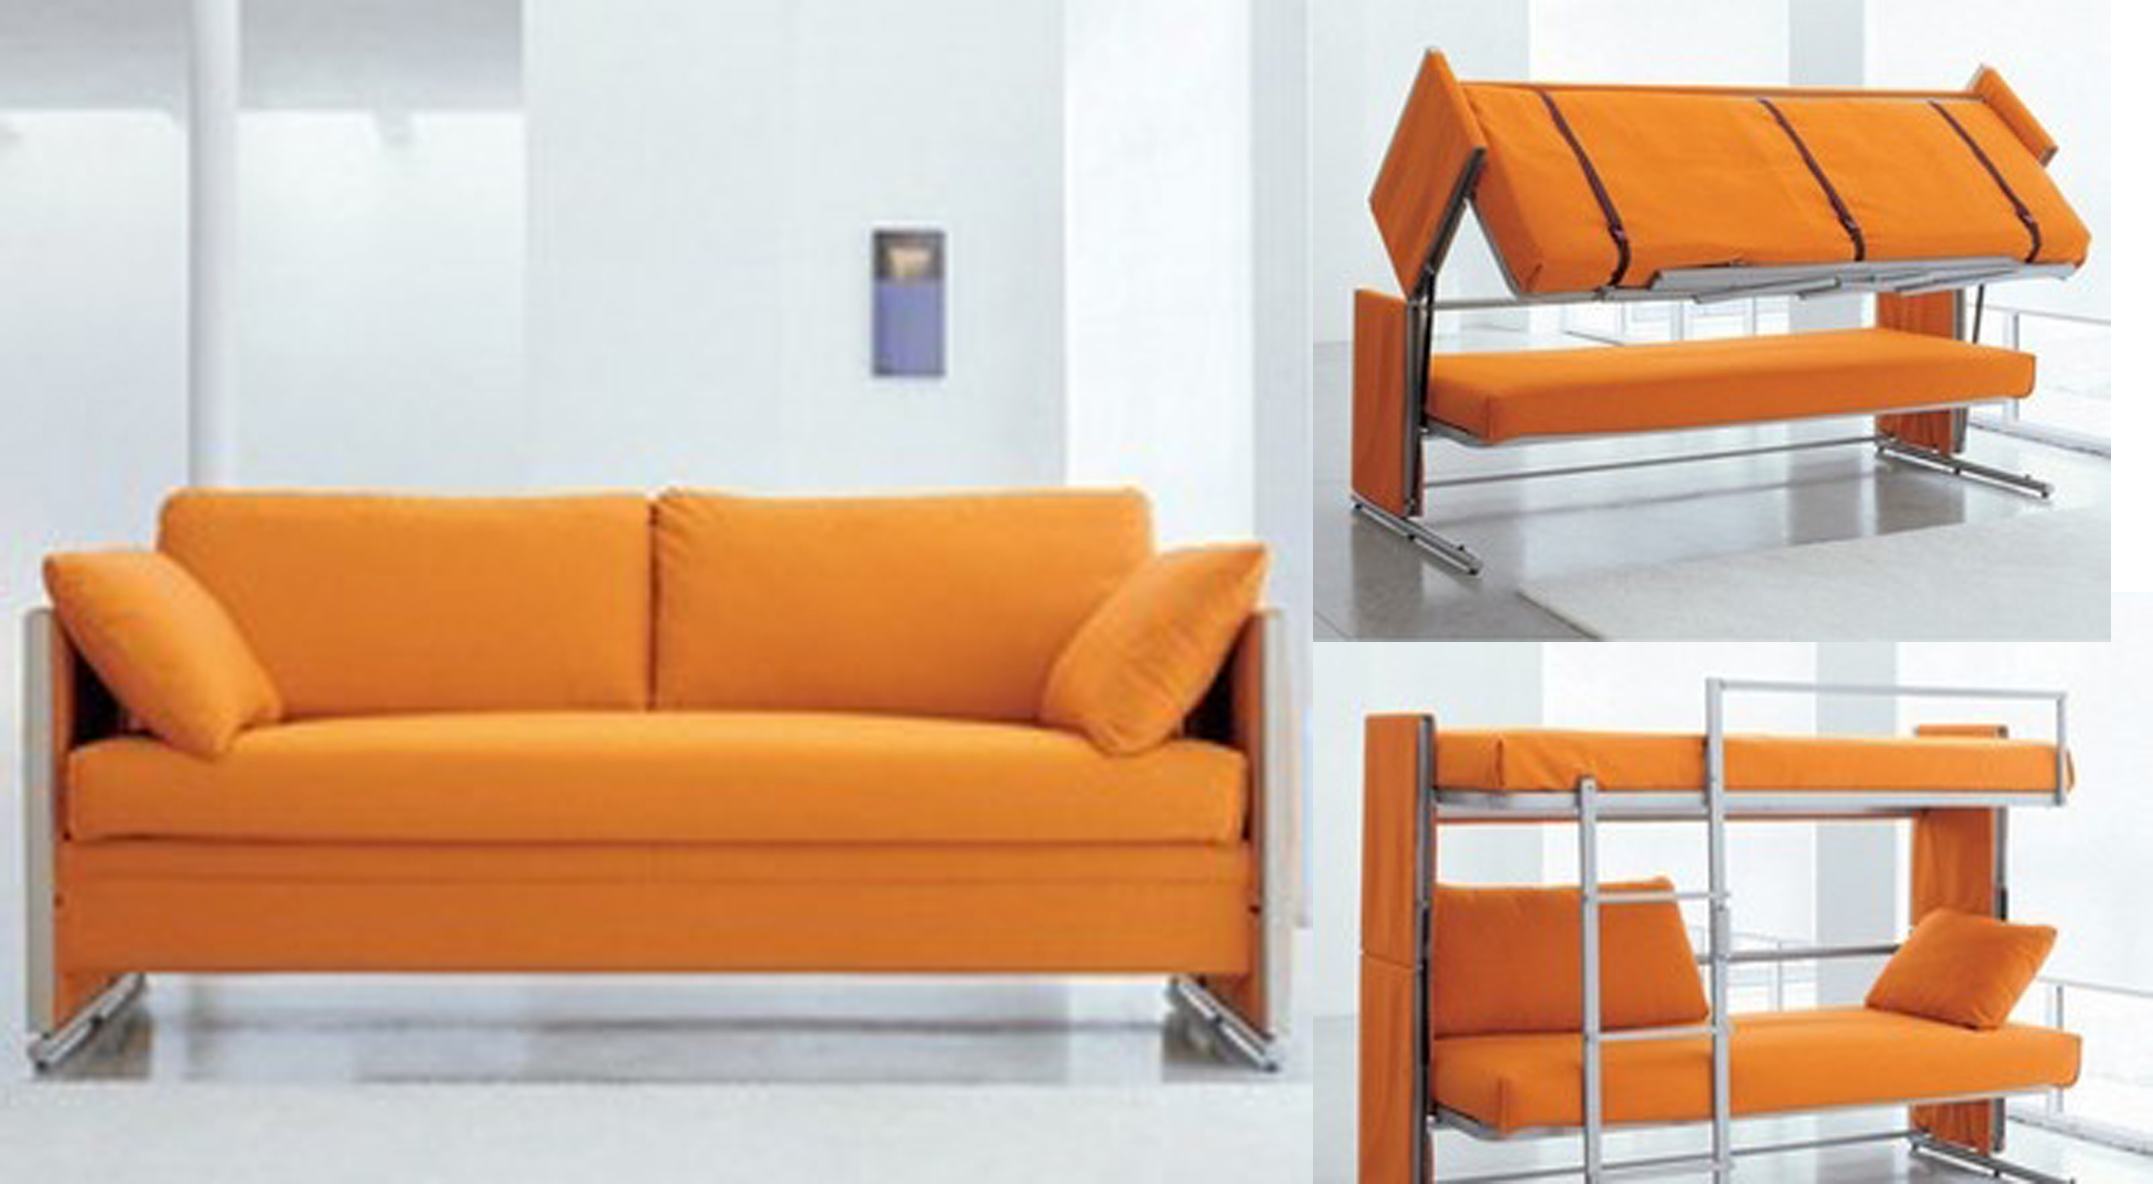 sofa into bed malaysian wood set philippines blog the rug establishment